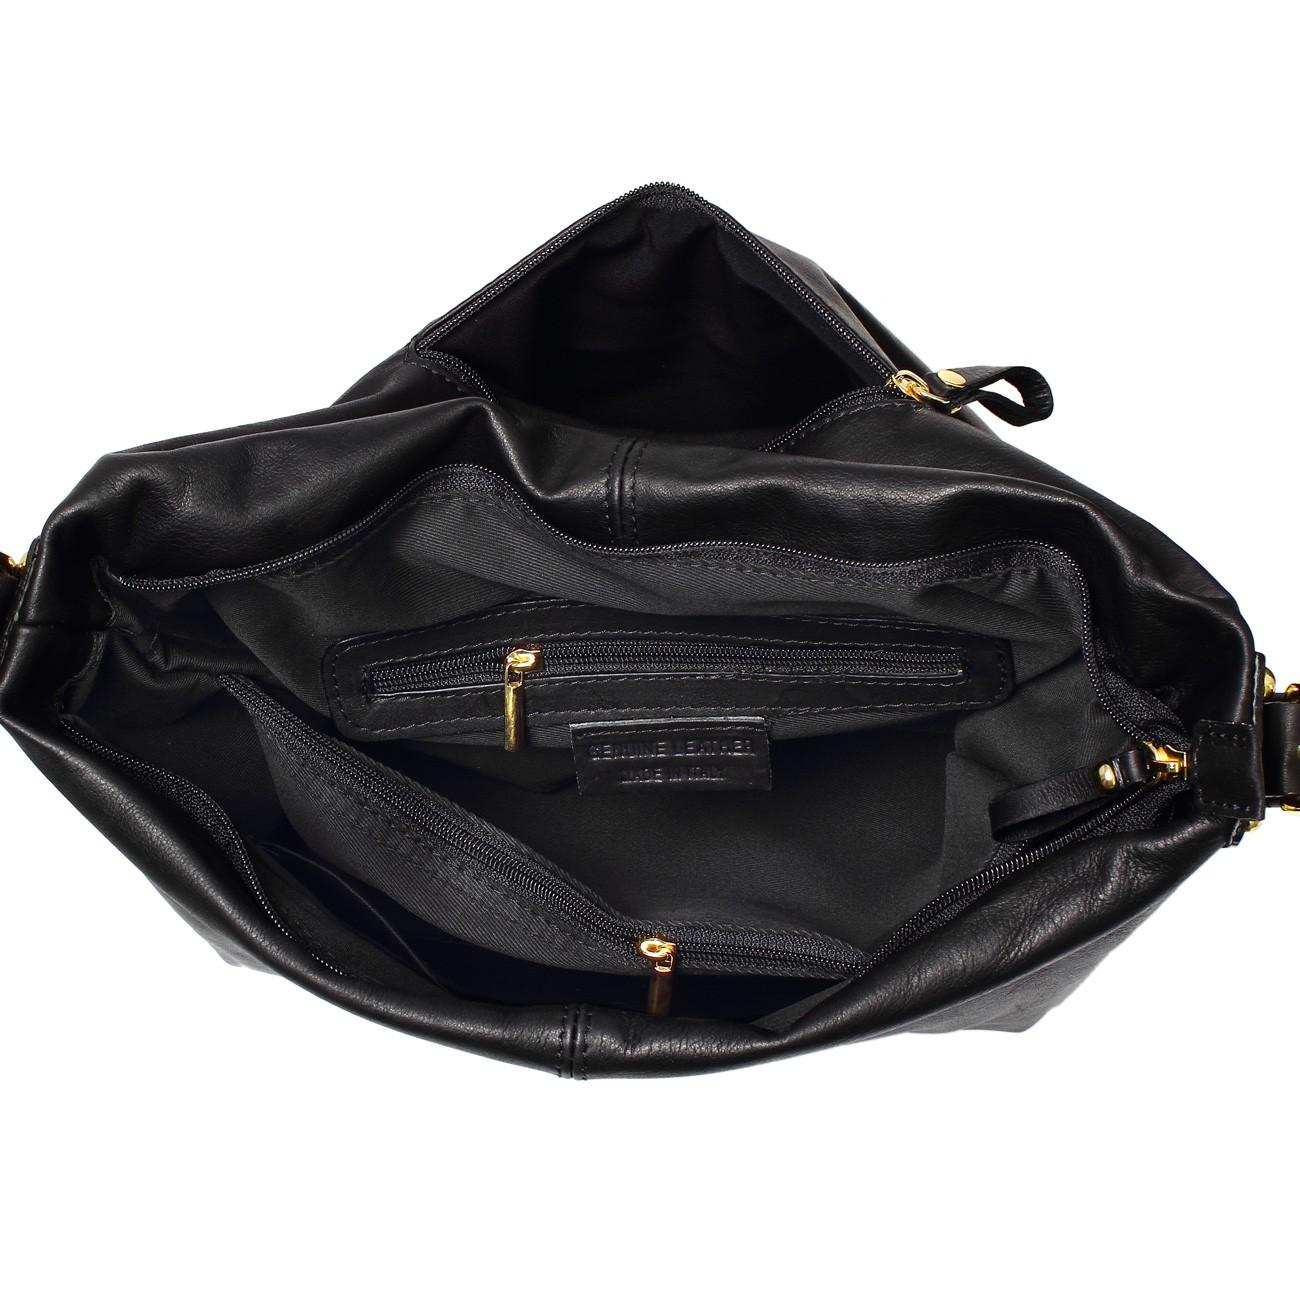 caspar damen tasche handtasche schultertasche beutel leder. Black Bedroom Furniture Sets. Home Design Ideas